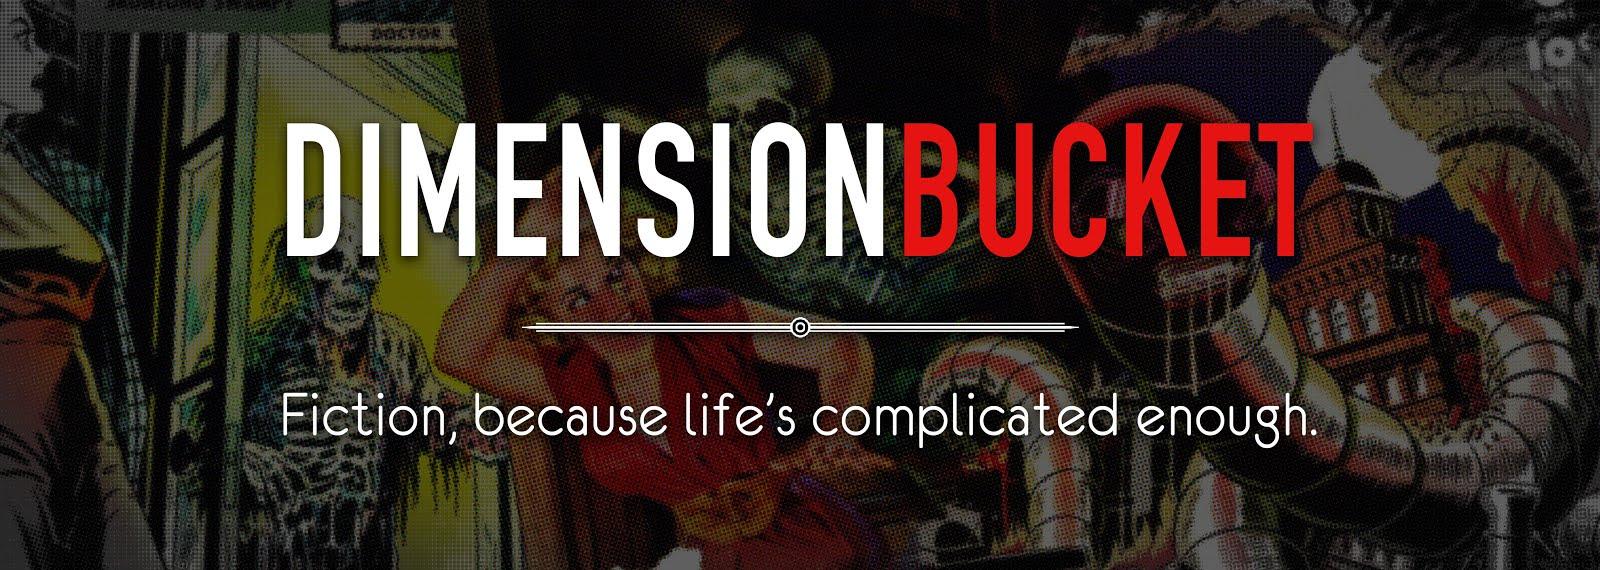 DimensionBucket Media